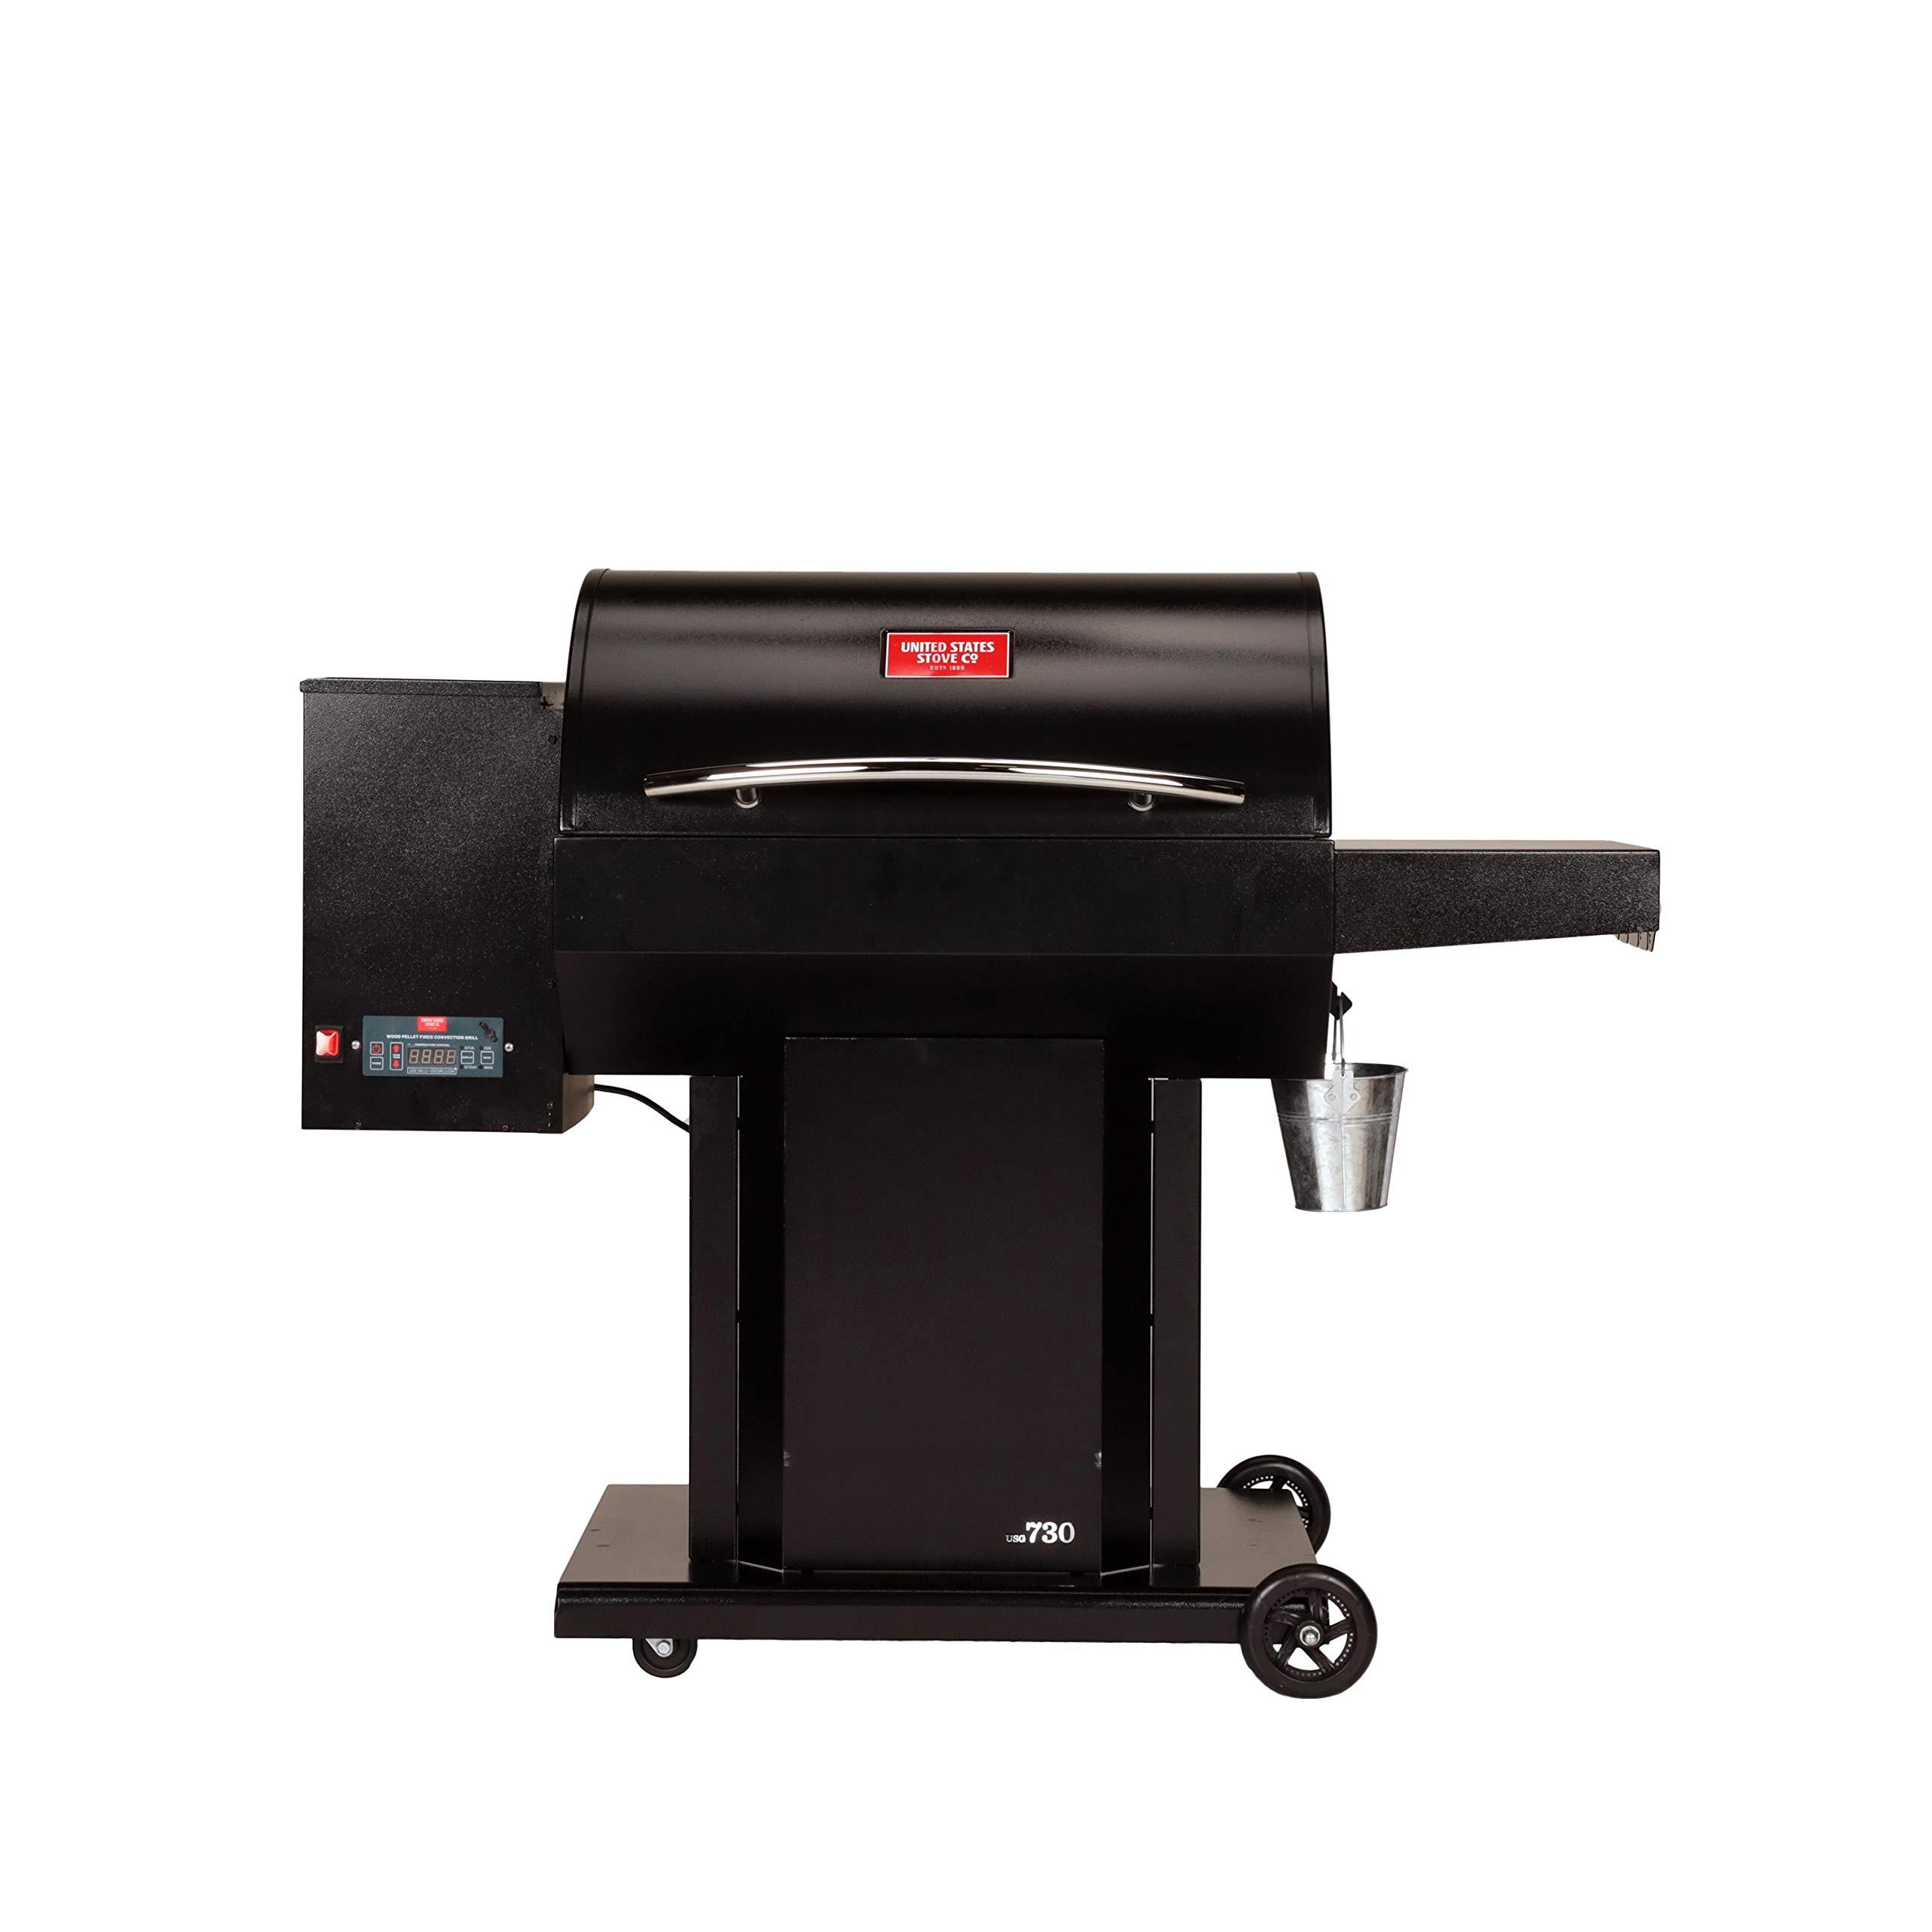 US Stove USSC Grills Cumberland USG730 Pellet Grill, Black